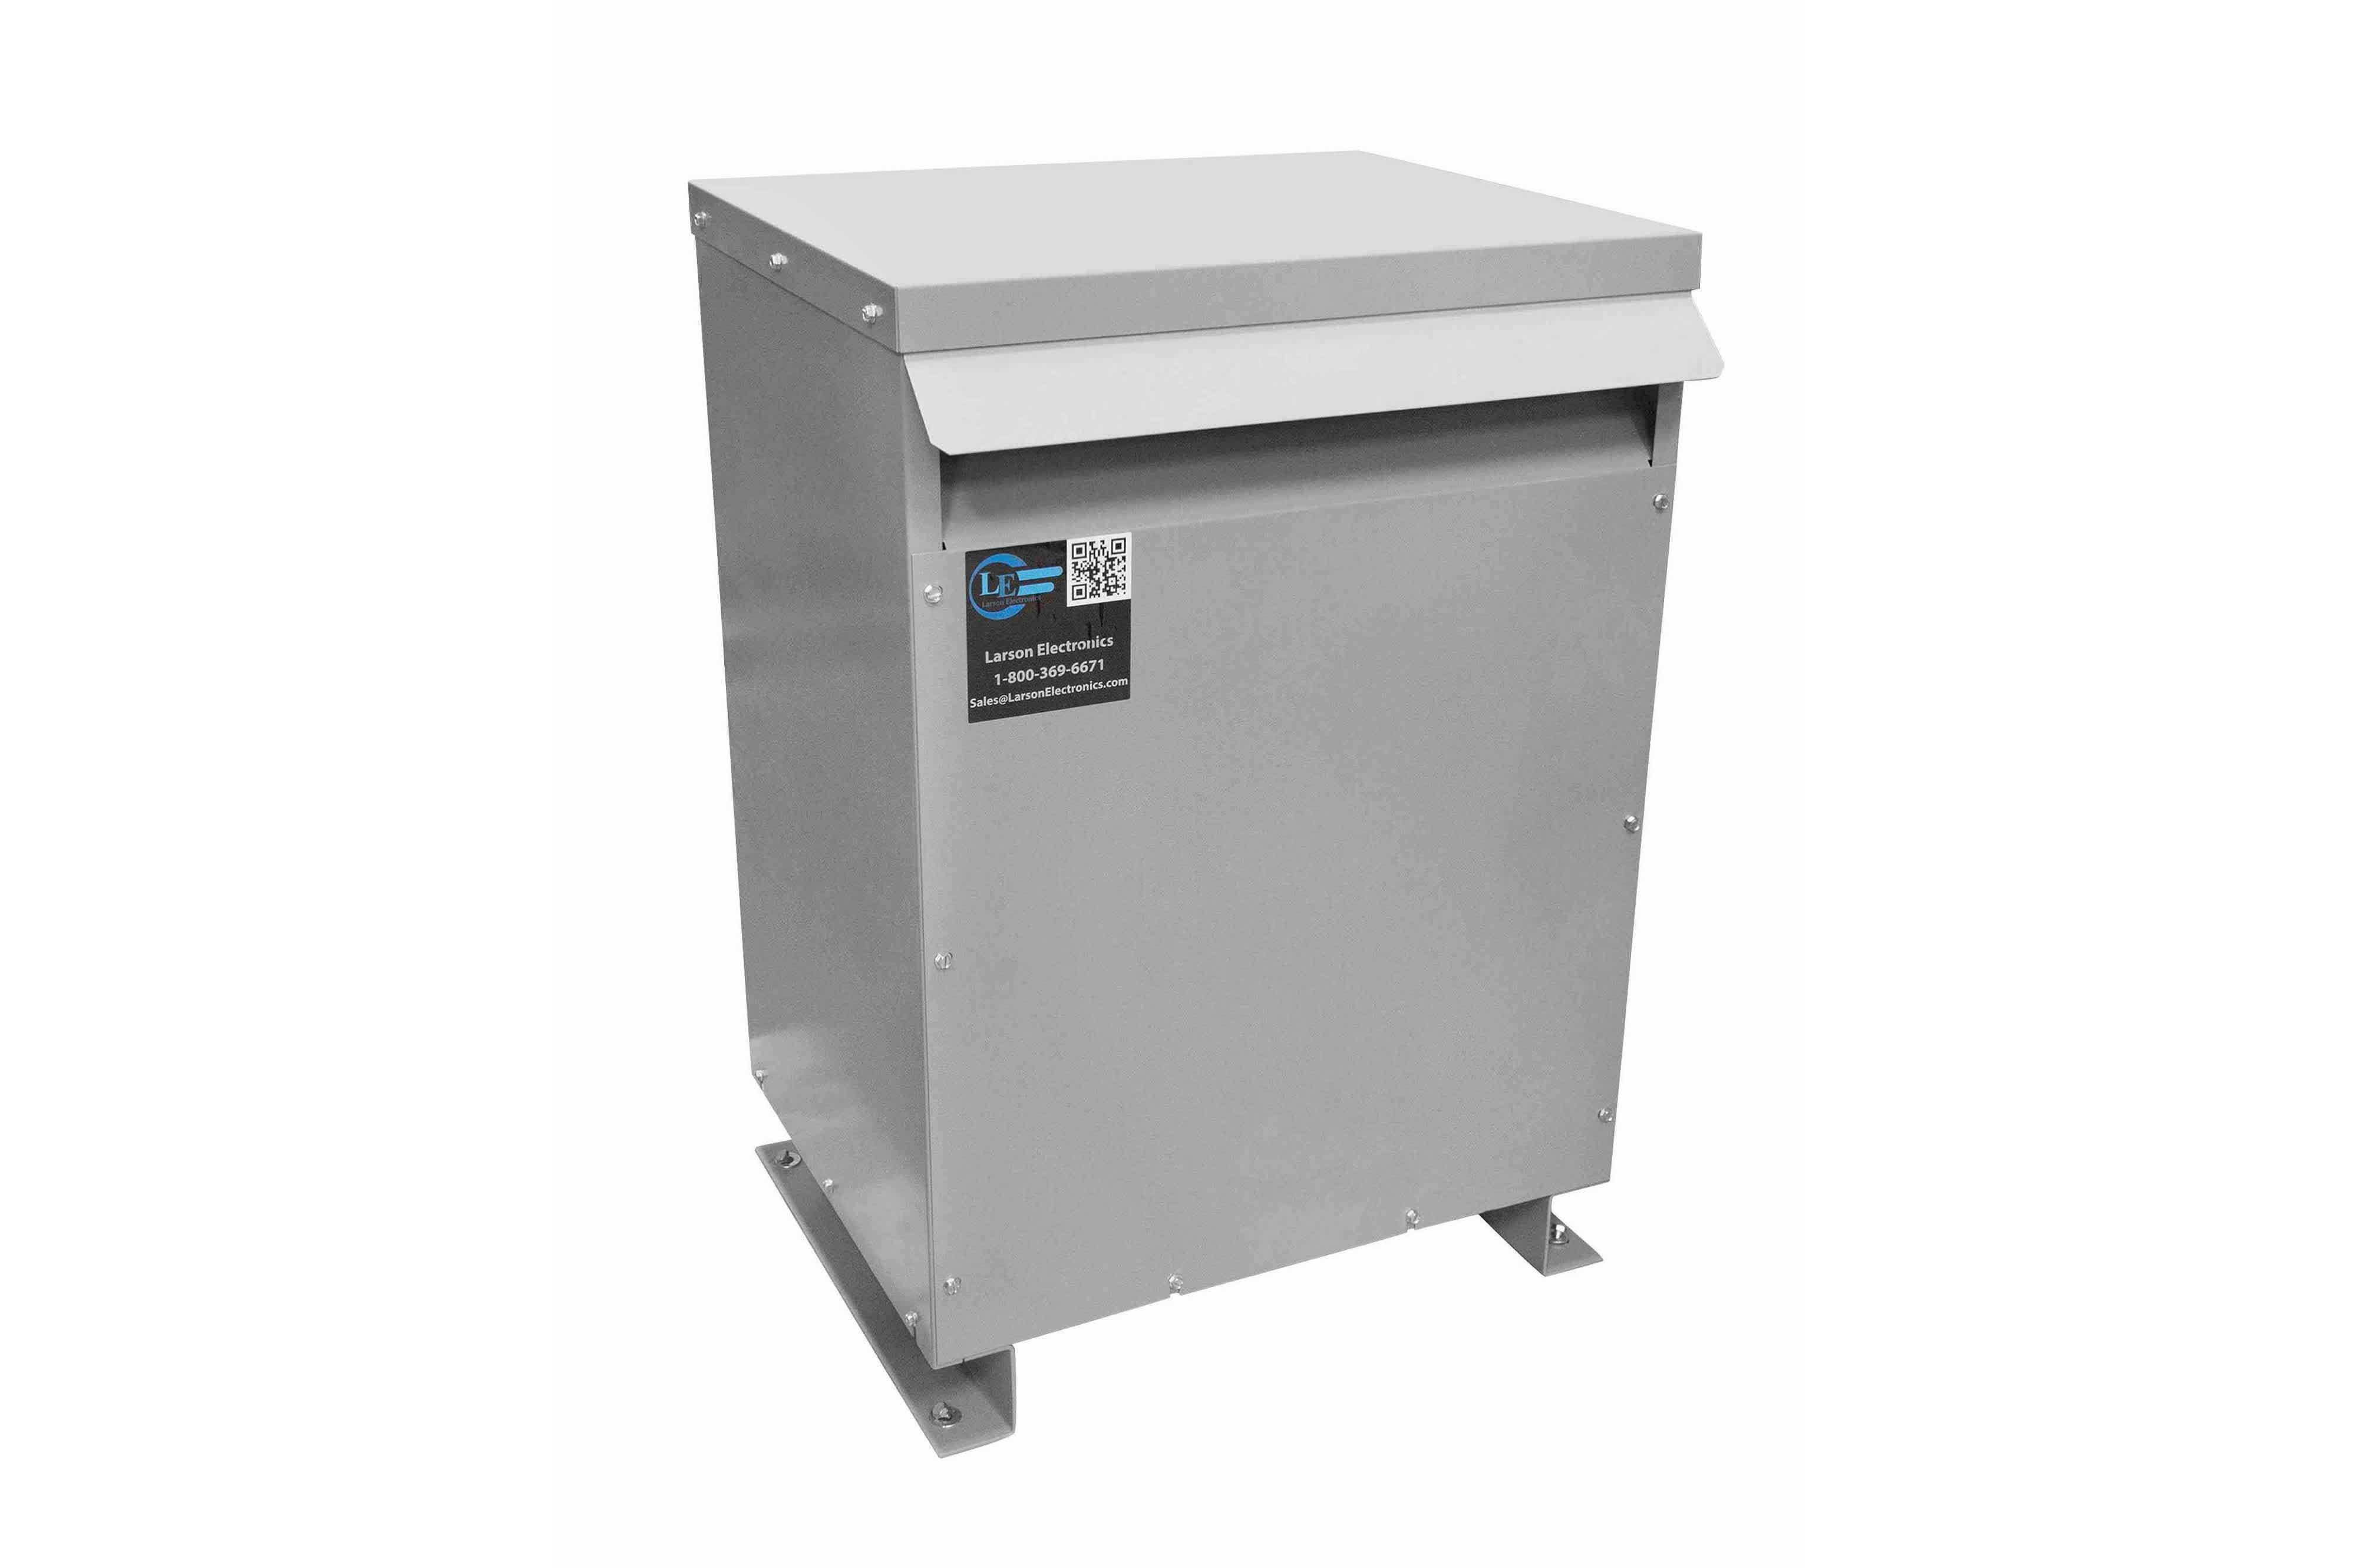 500 kVA 3PH DOE Transformer, 480V Delta Primary, 380Y/220 Wye-N Secondary, N3R, Ventilated, 60 Hz